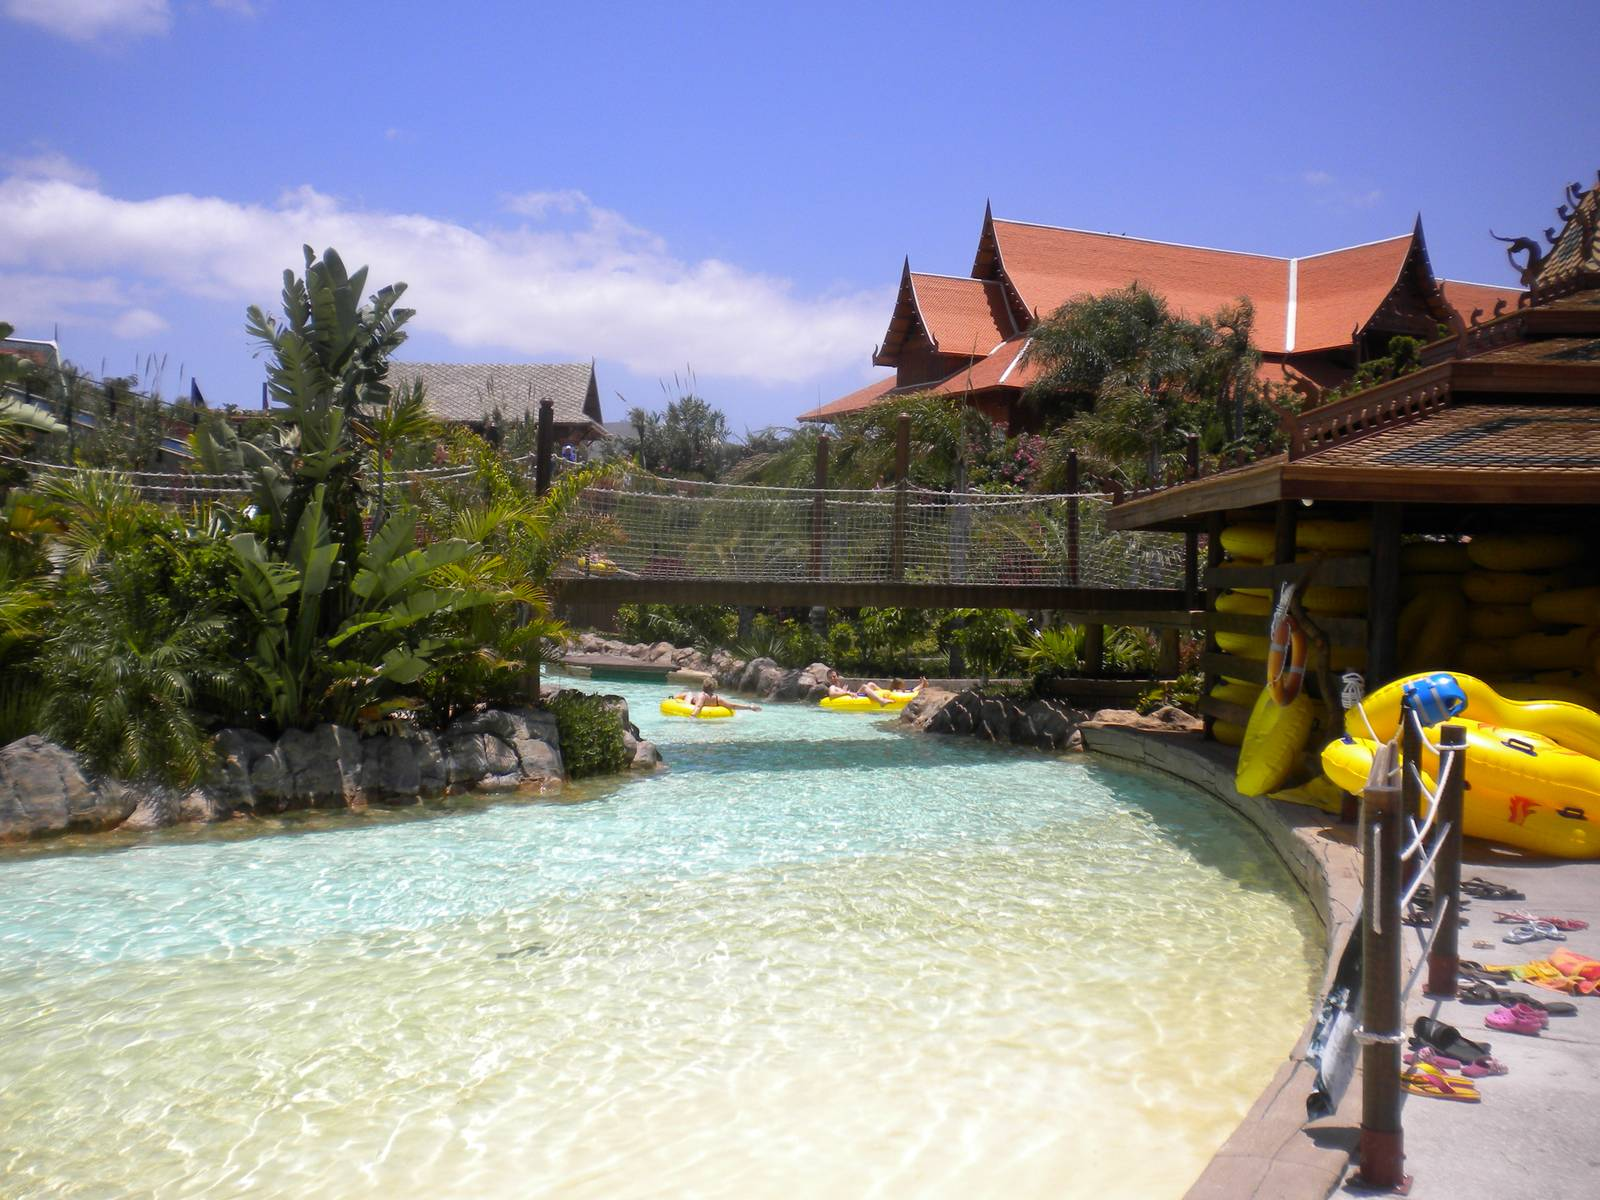 siam park13 Siam Park More Than a Water Park